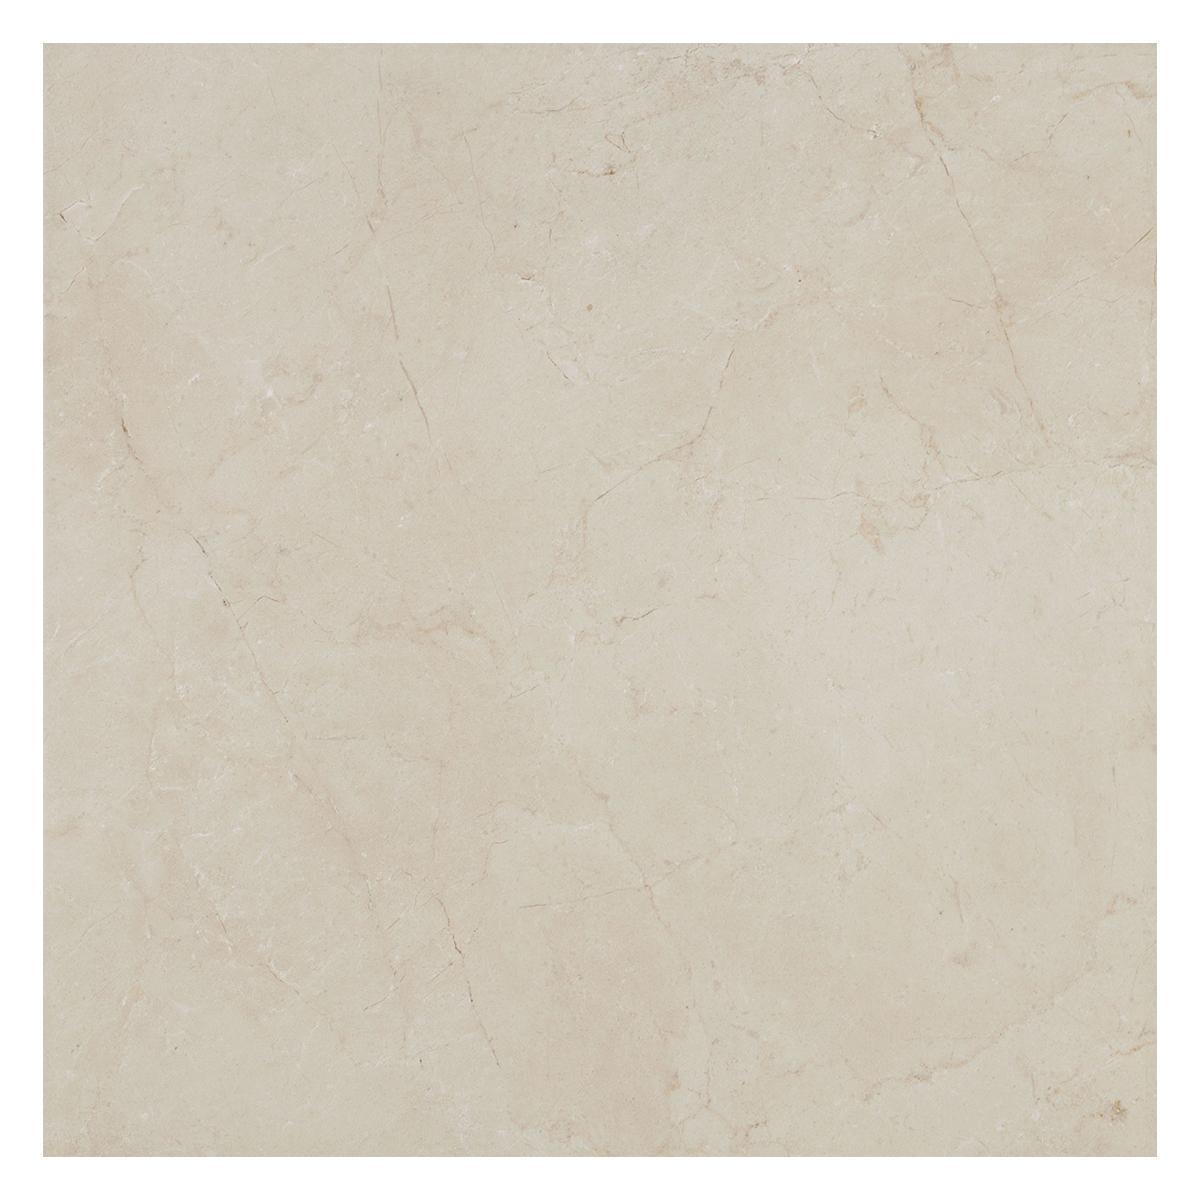 Porcelanato Sevilha Beige Mate - 59X59 cm - 1.39 m2